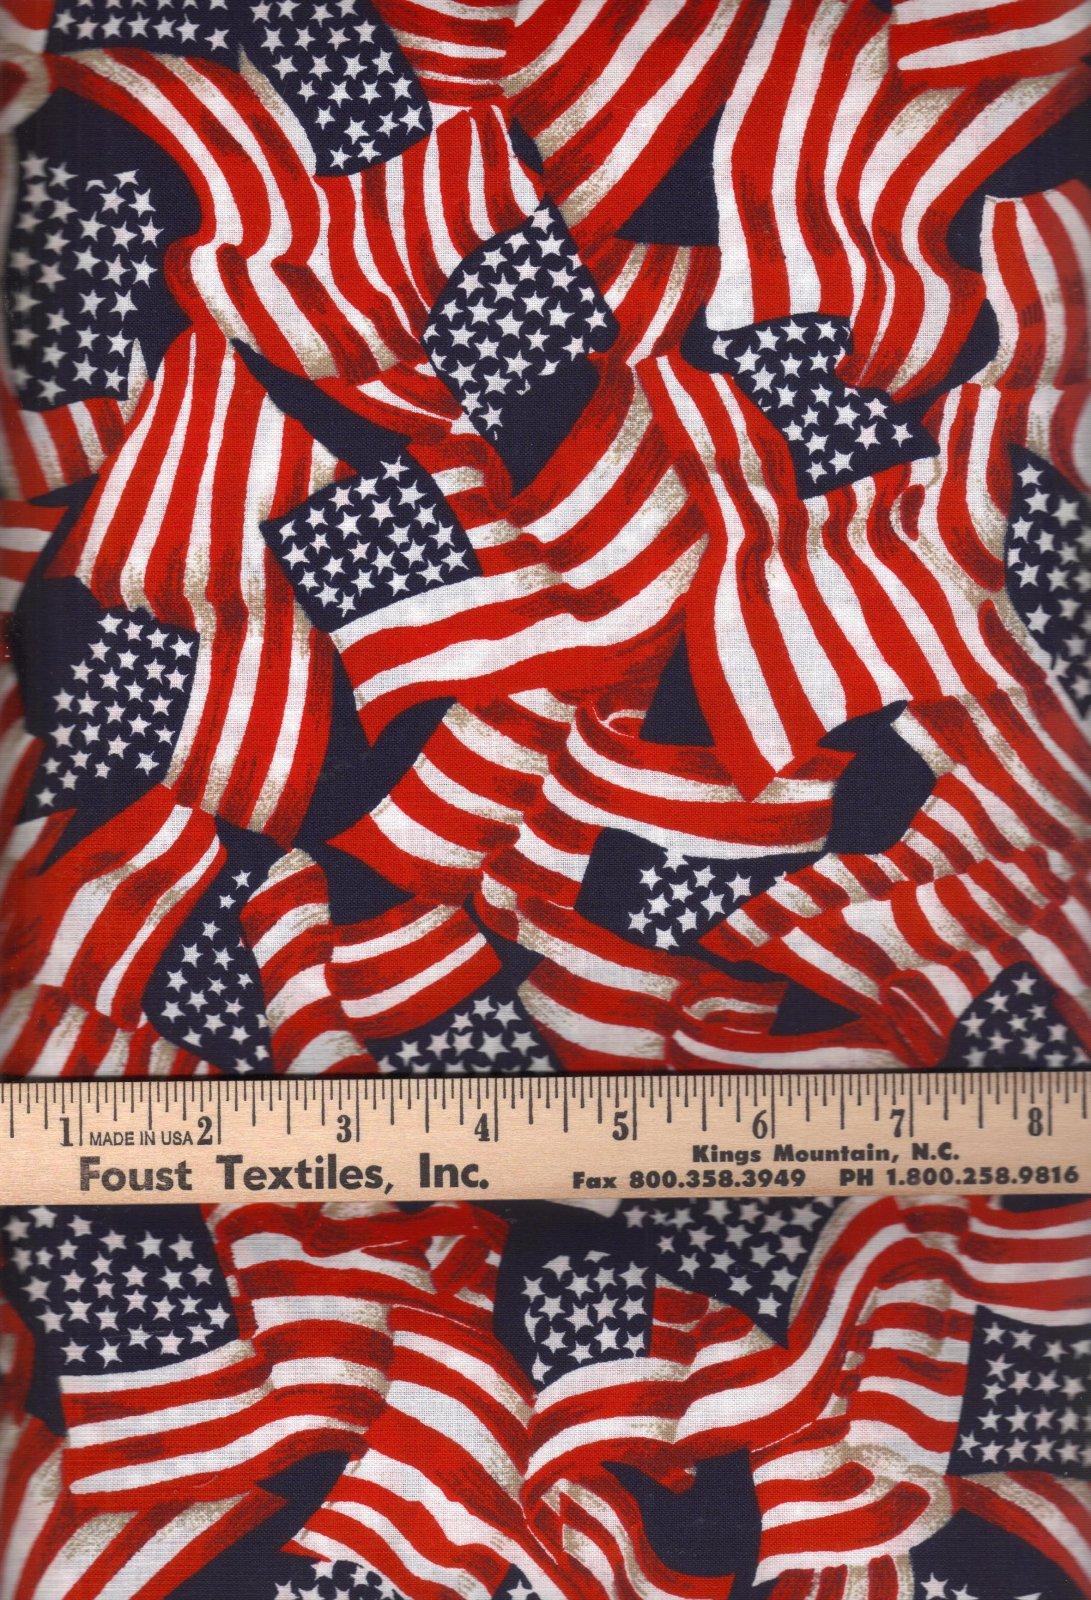 Made in the USA 41355 RWB